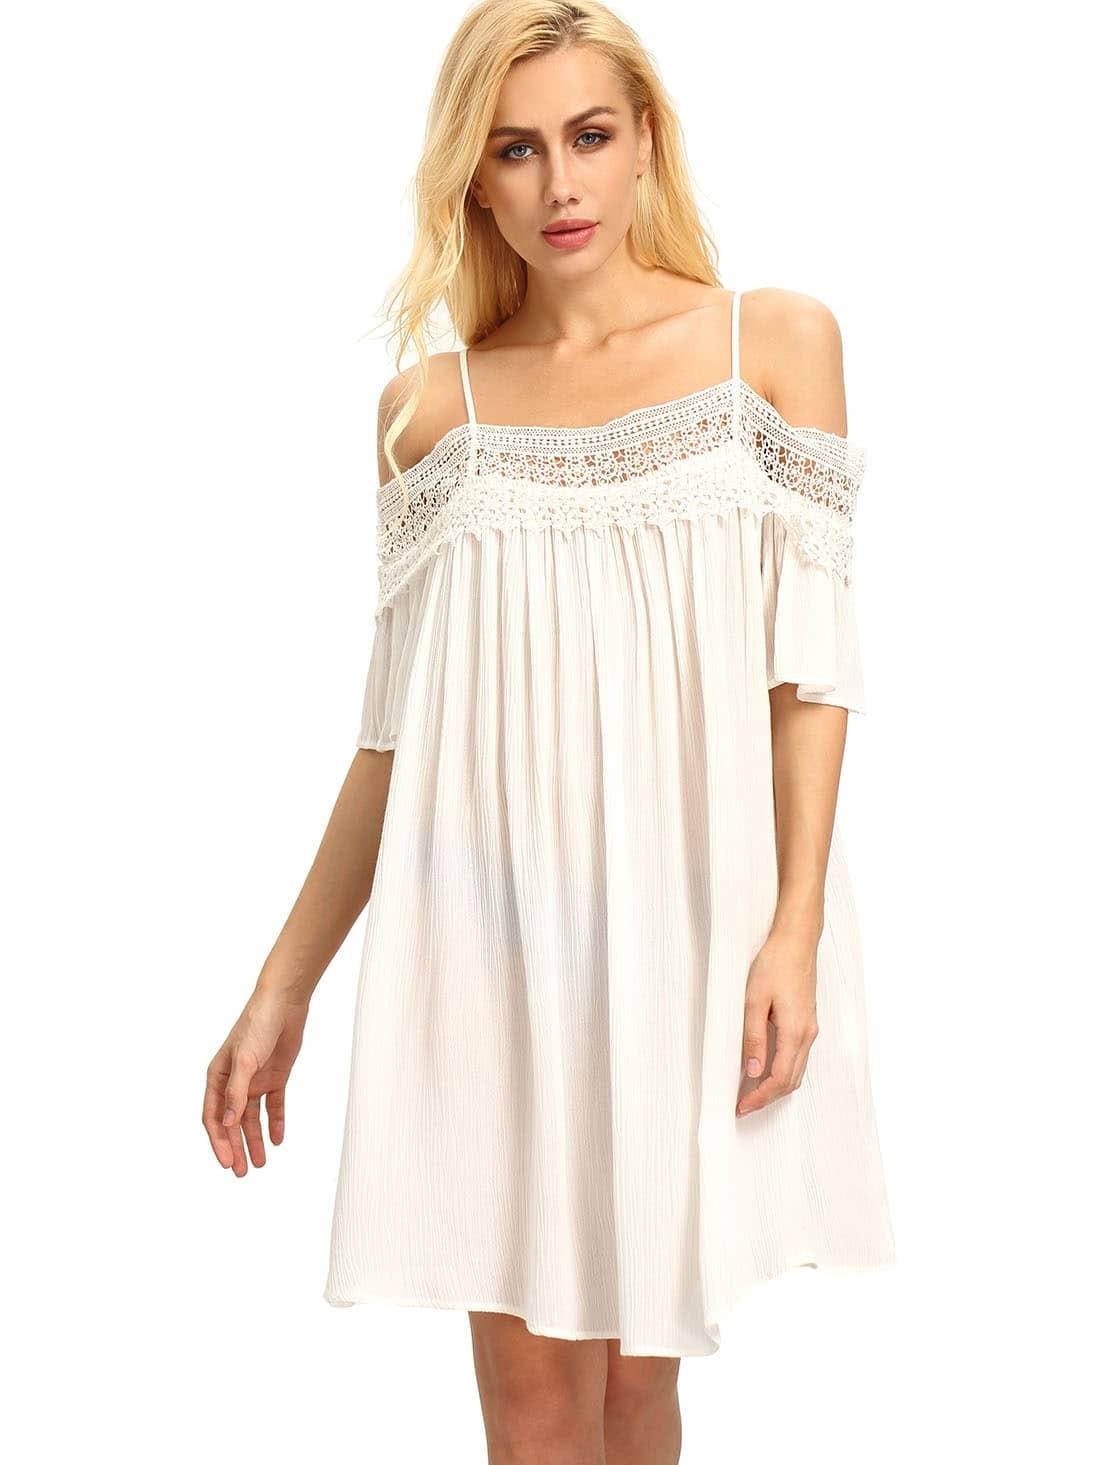 Фото Panelled Cold Shoulder With Lace Frill Cuff Pleated Dress. Купить с доставкой